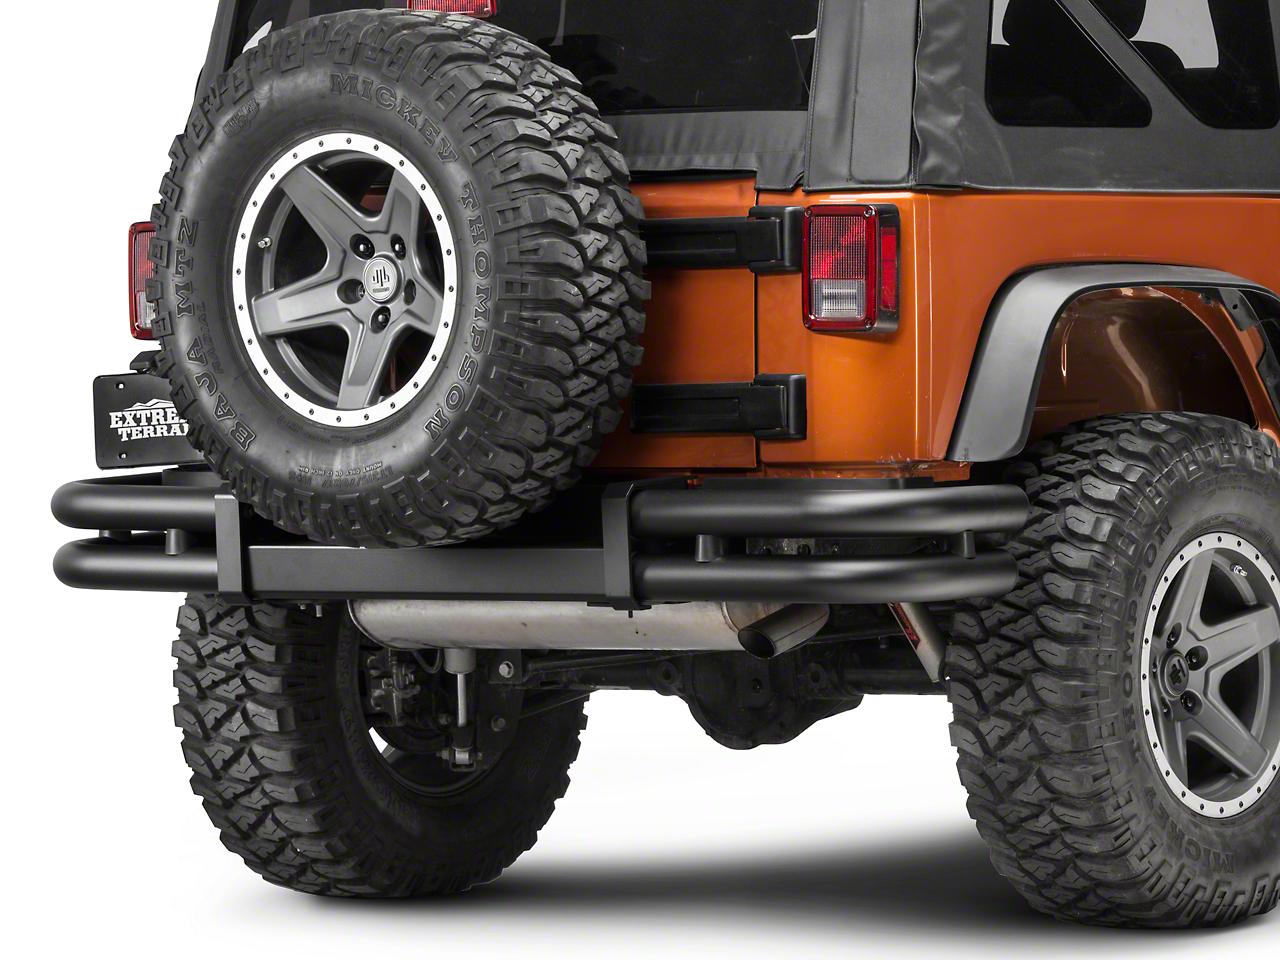 Mopar Tubular Rear Bumper - Black (07-18 Jeep Wrangler JK)